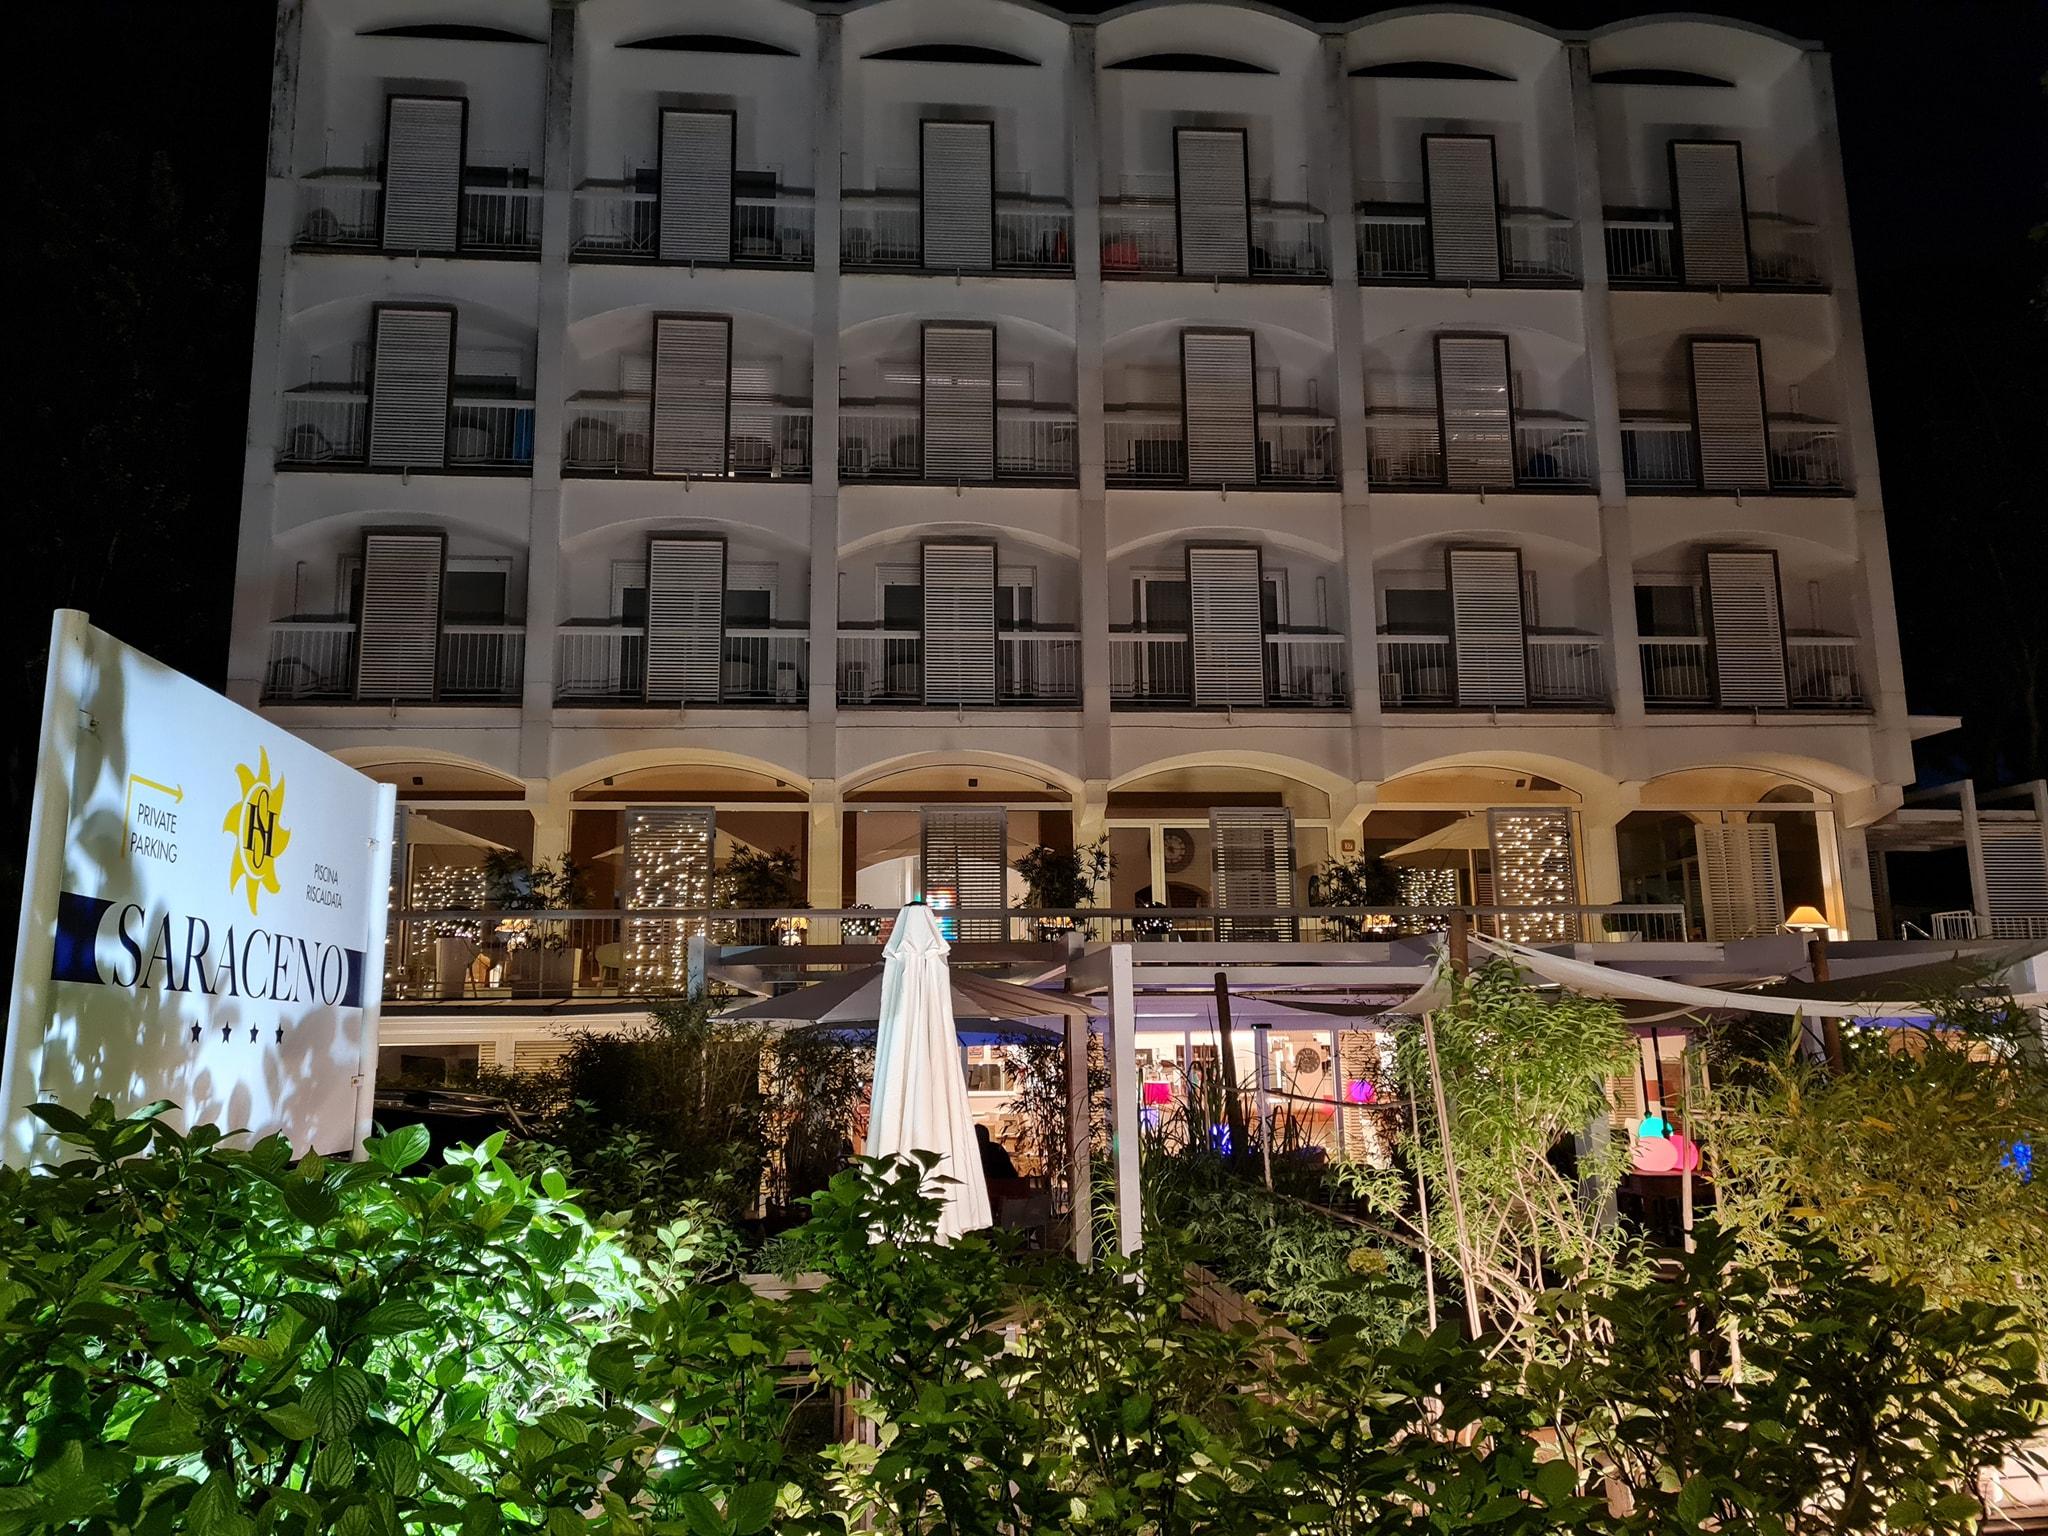 hotel saraceno facciata notturna milano marittima